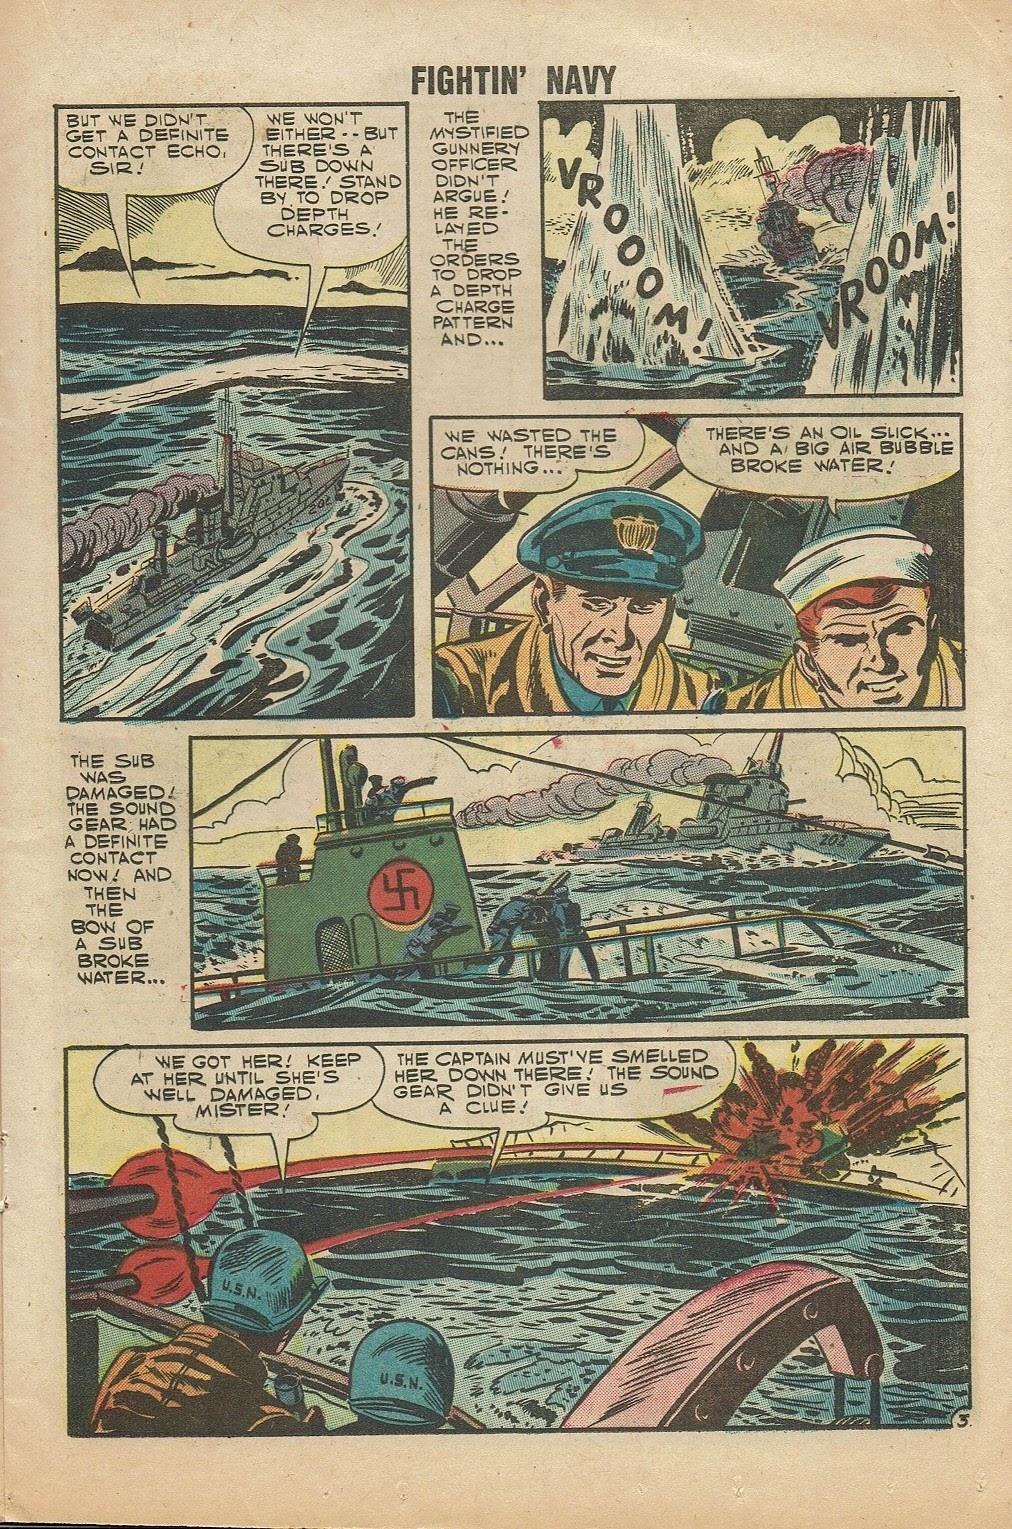 Read online Fightin' Navy comic -  Issue #81 - 17